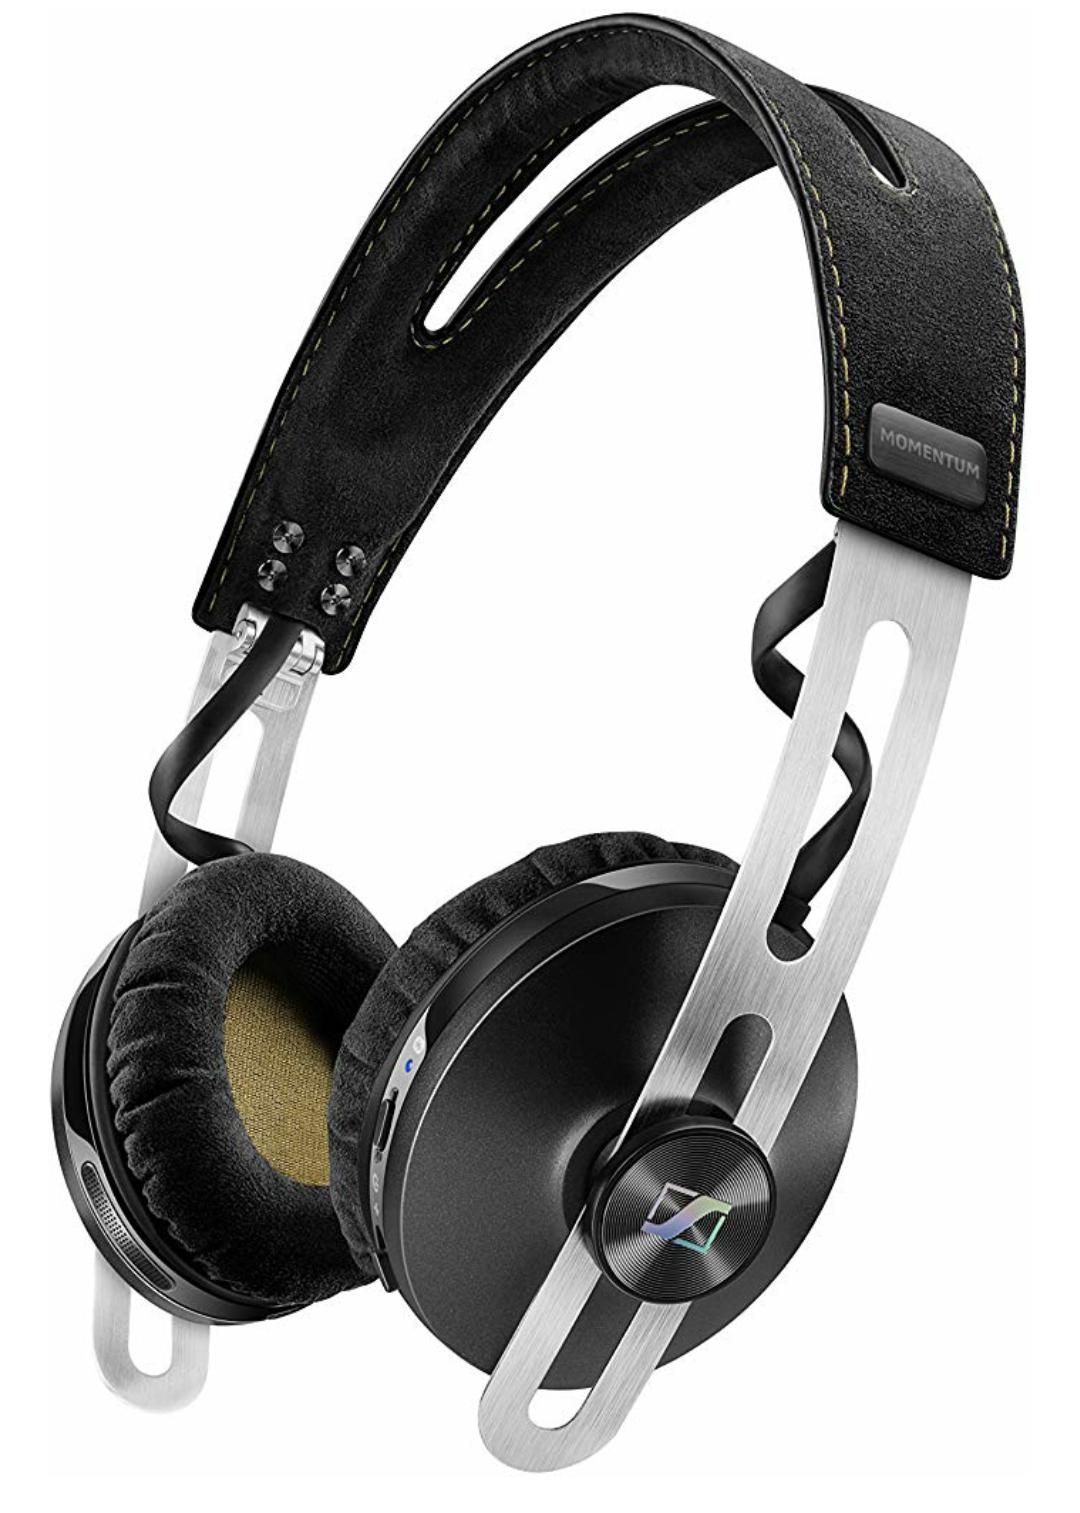 Sennheiser Momentum 2.0 Wireless On-Ear Active Noise Canceling Kopfhörer, Bluetooth 4.0, NFC // Over-Ear für 193,01€ statt 249€